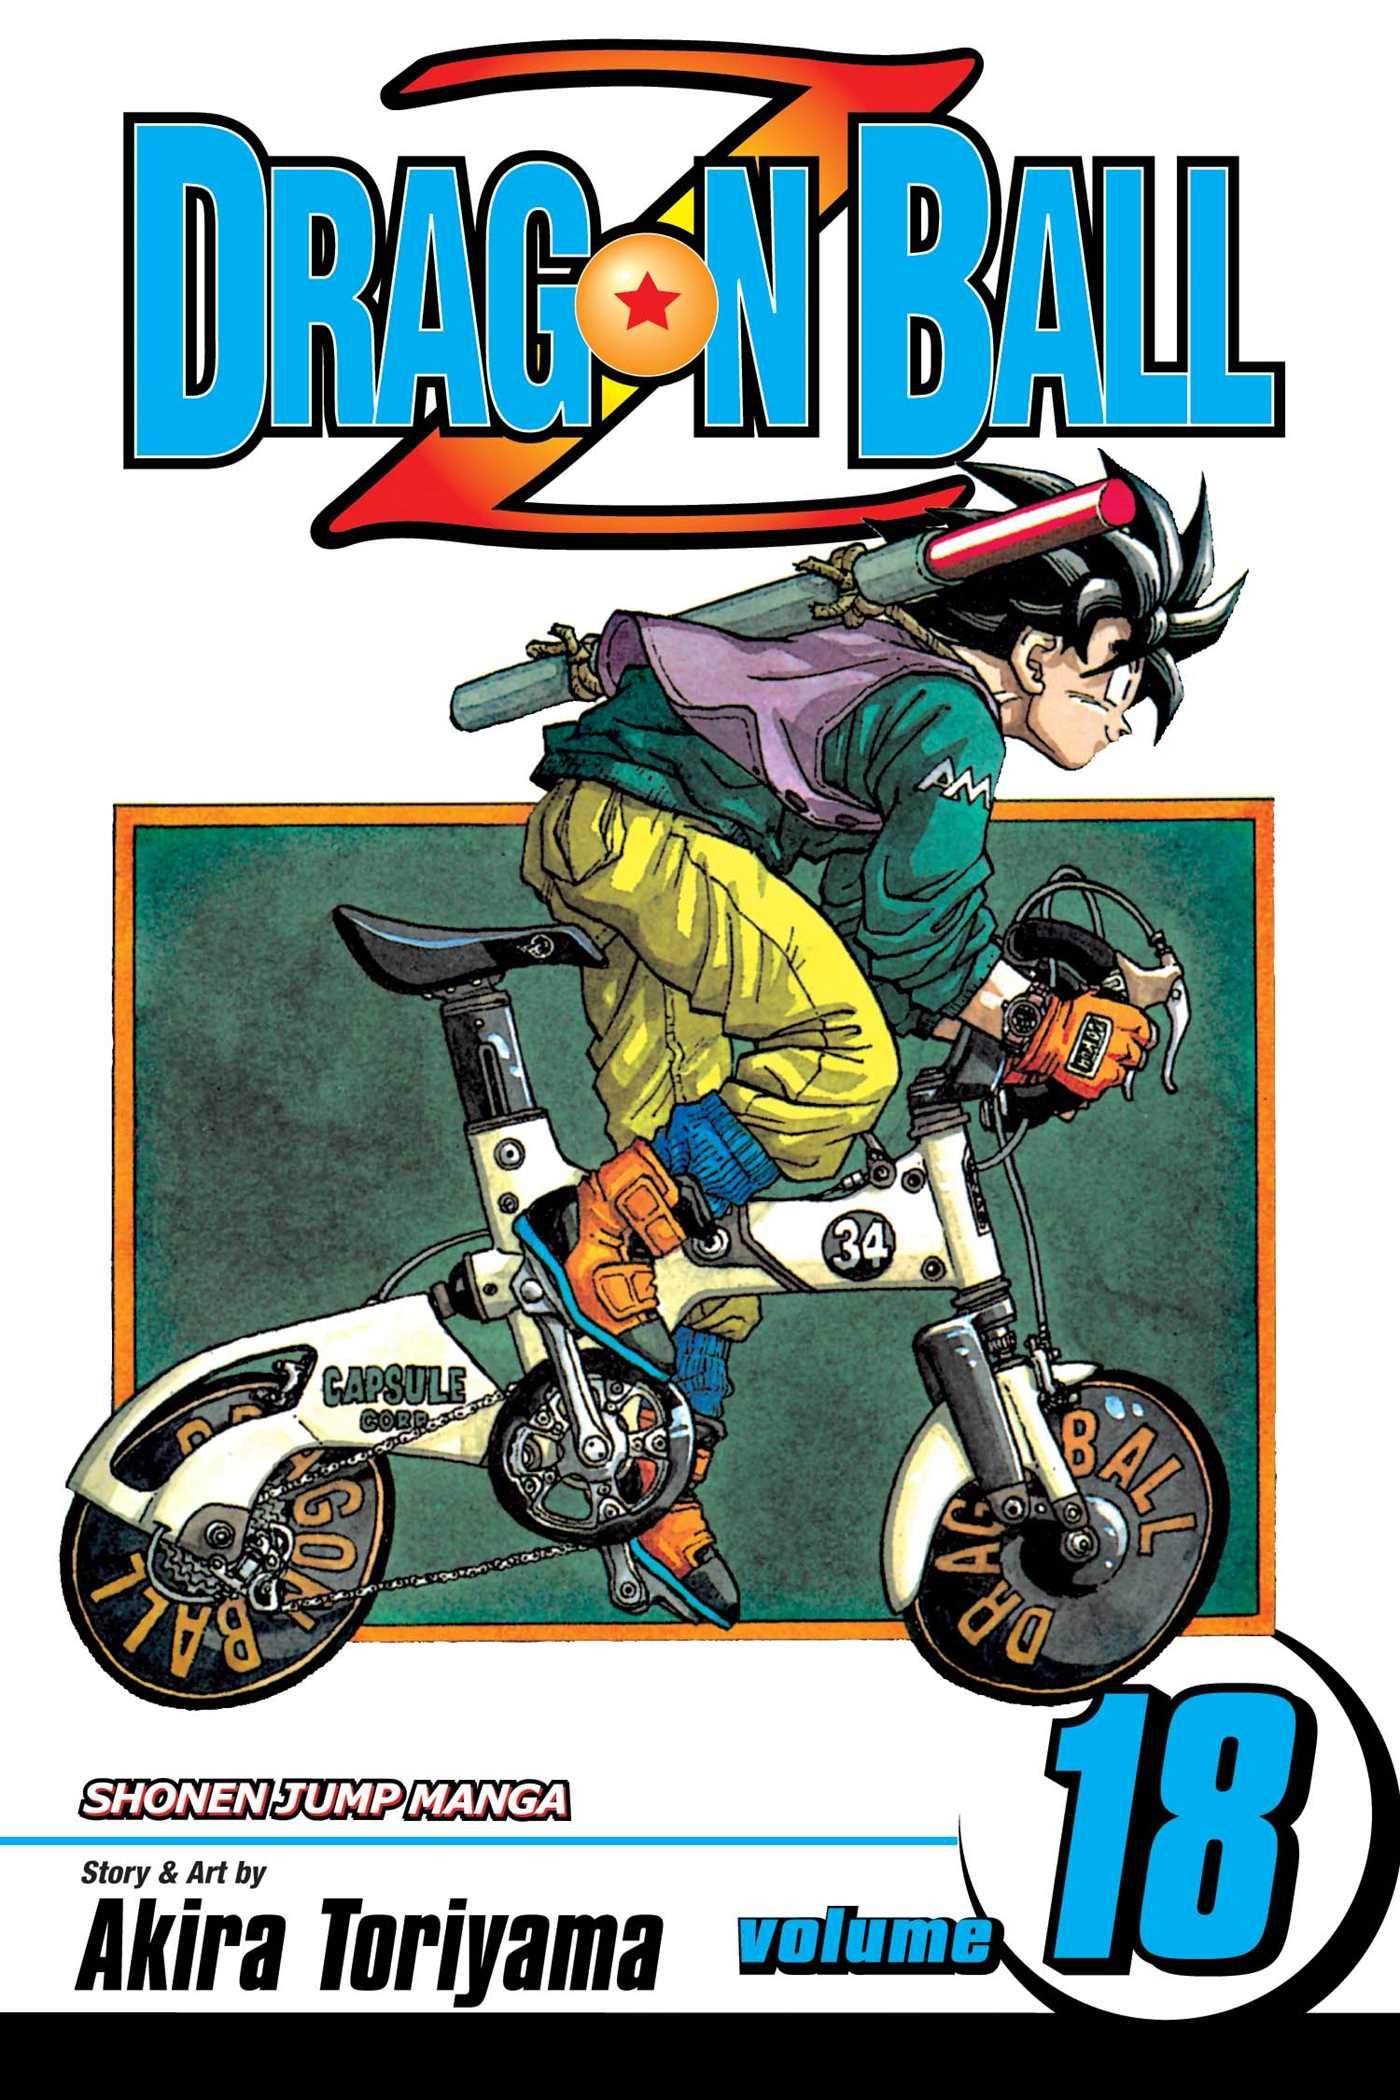 Dragon Ball Z Vol 18 Book By Akira Toriyama Official Publisher Page Simon Schuster